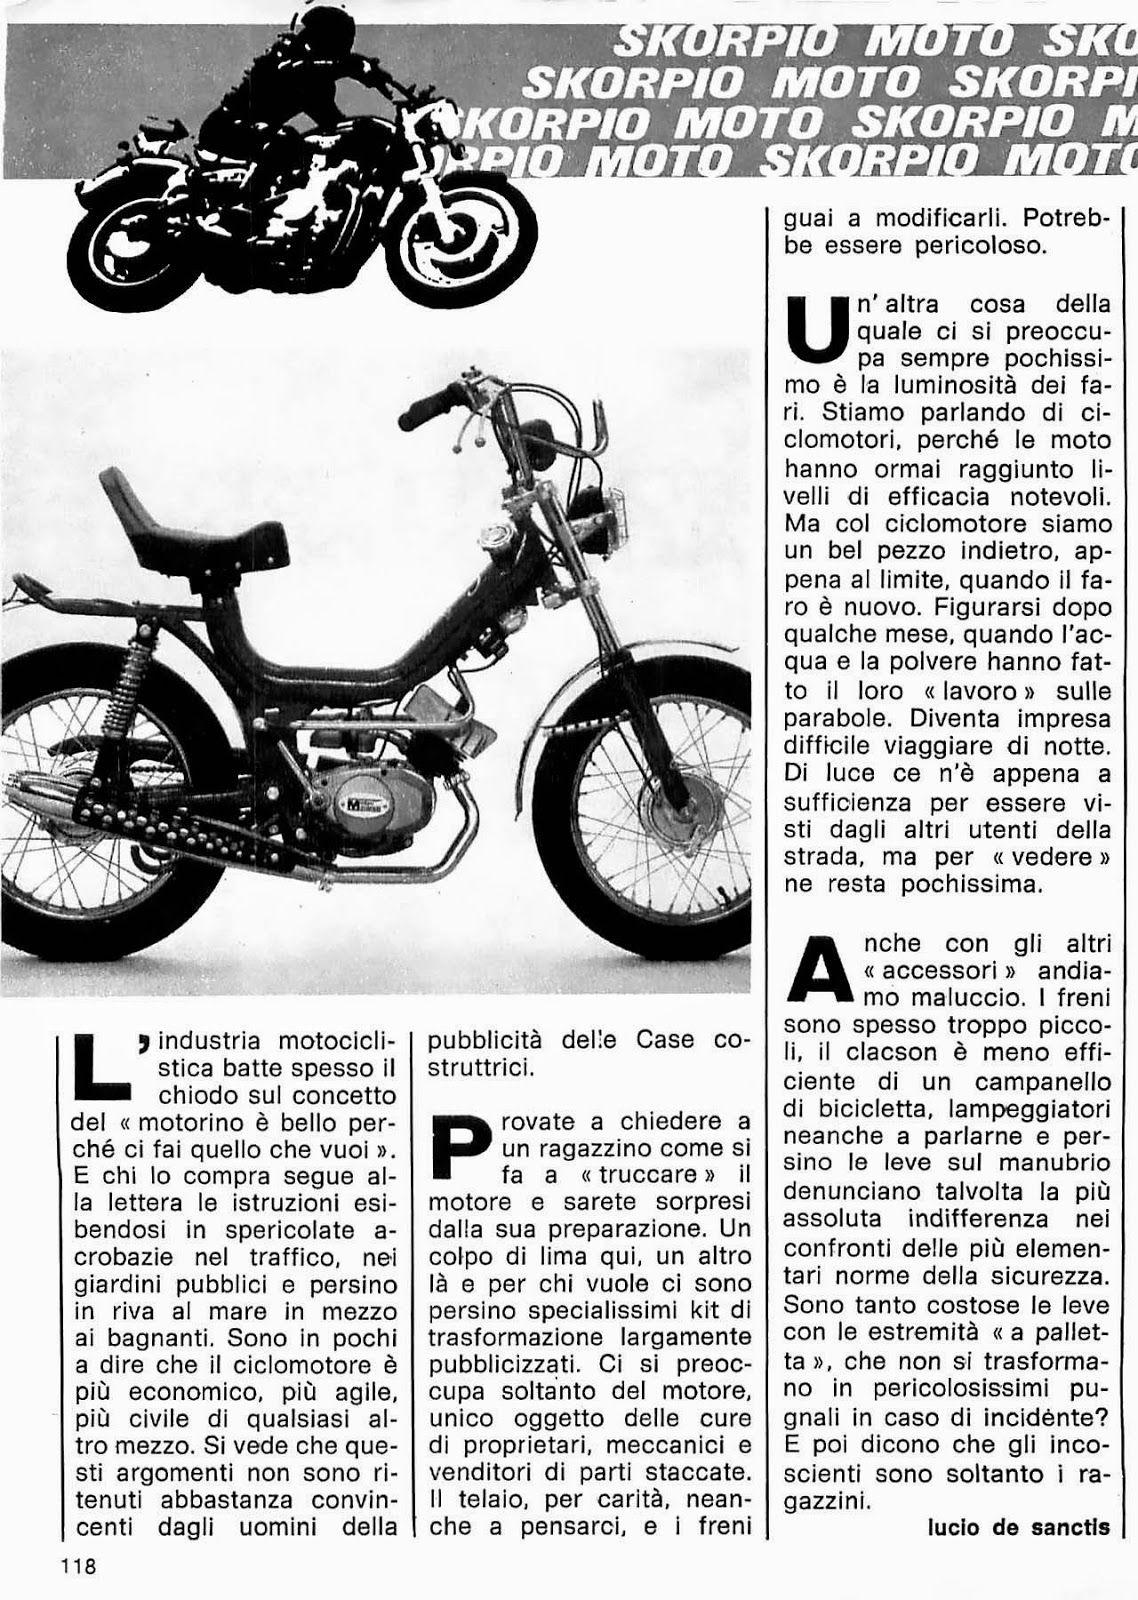 SCRIVOQUANDOVOGLIO: SKORPIO MOTO (02/12/1982)